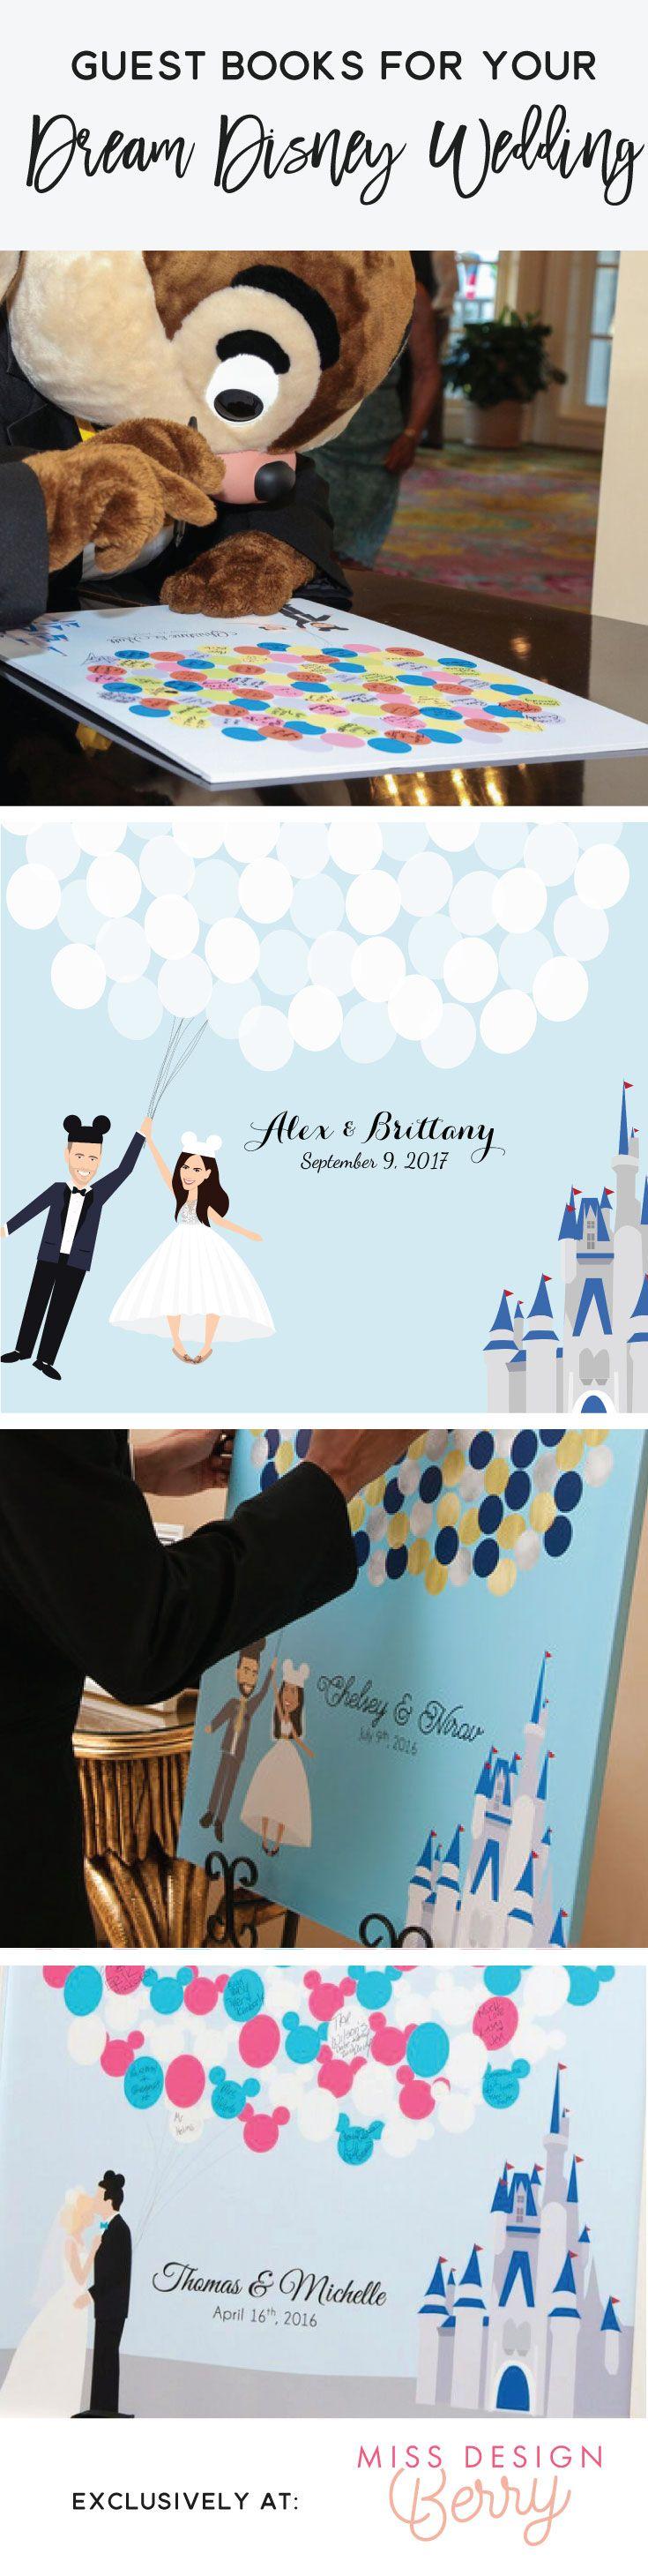 Best Wedding Style Board Images On   Wedding